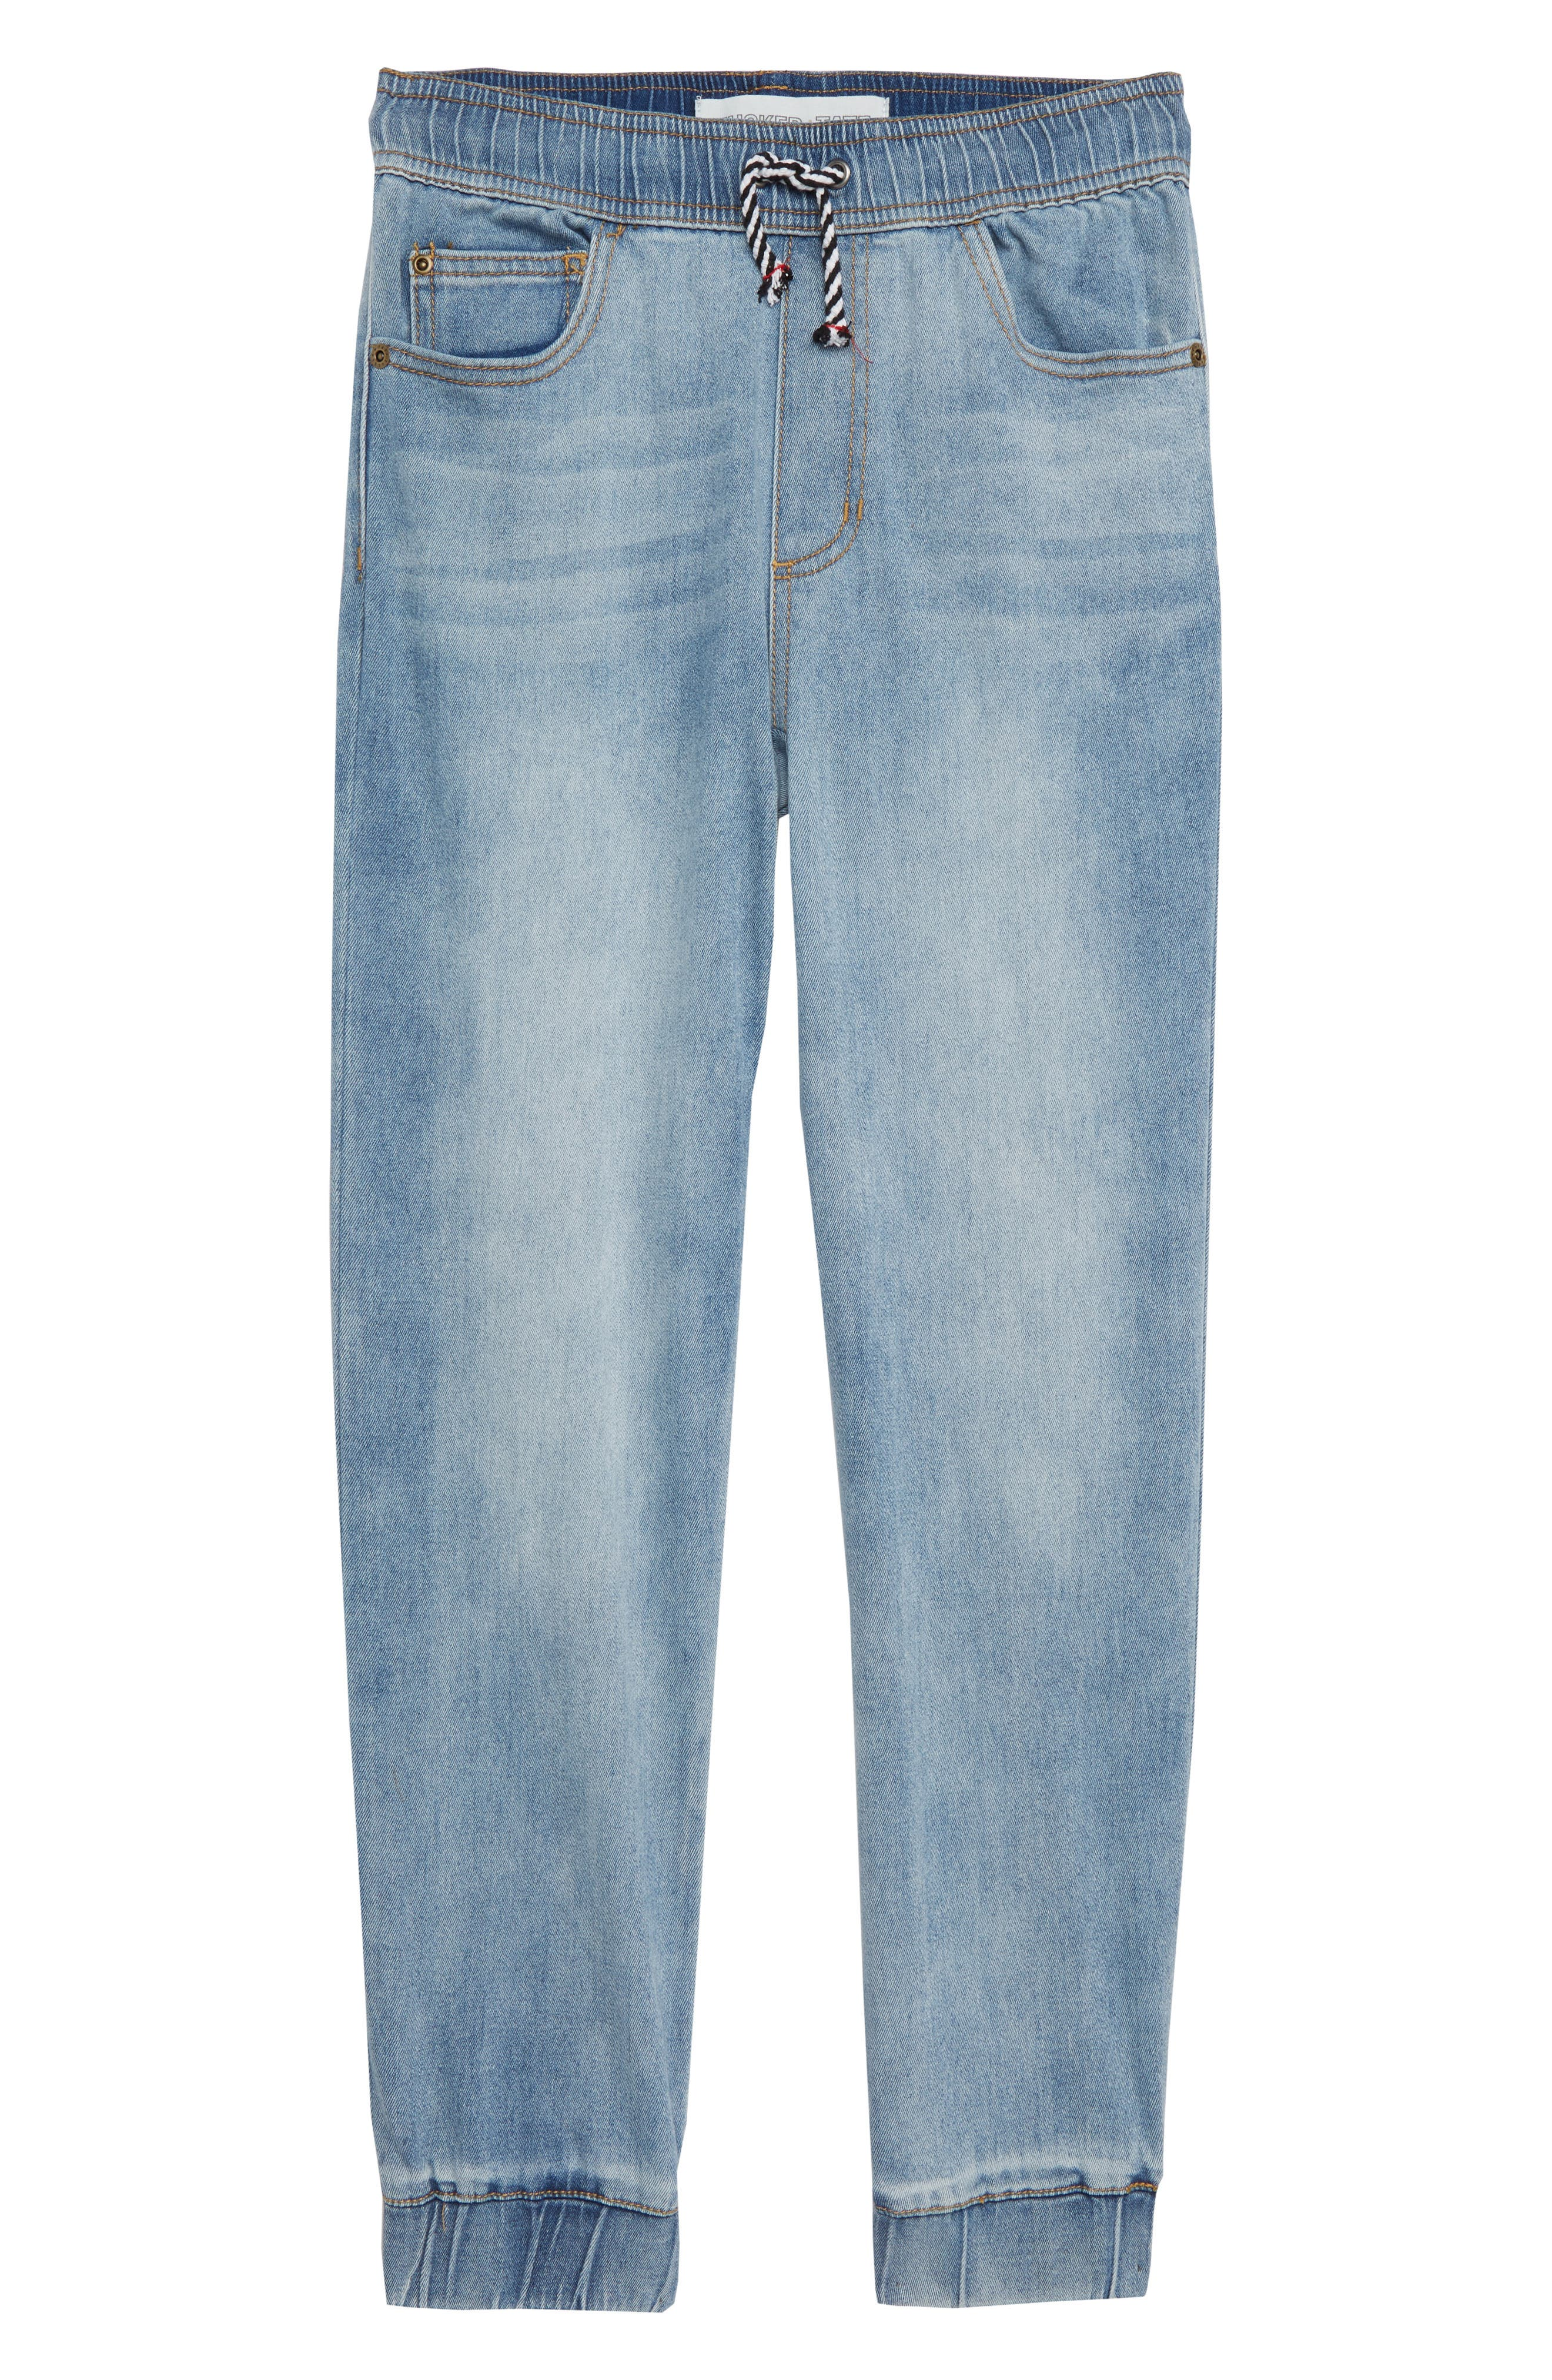 Denim Jogger Pants,                         Main,                         color, BRIDGER WASH